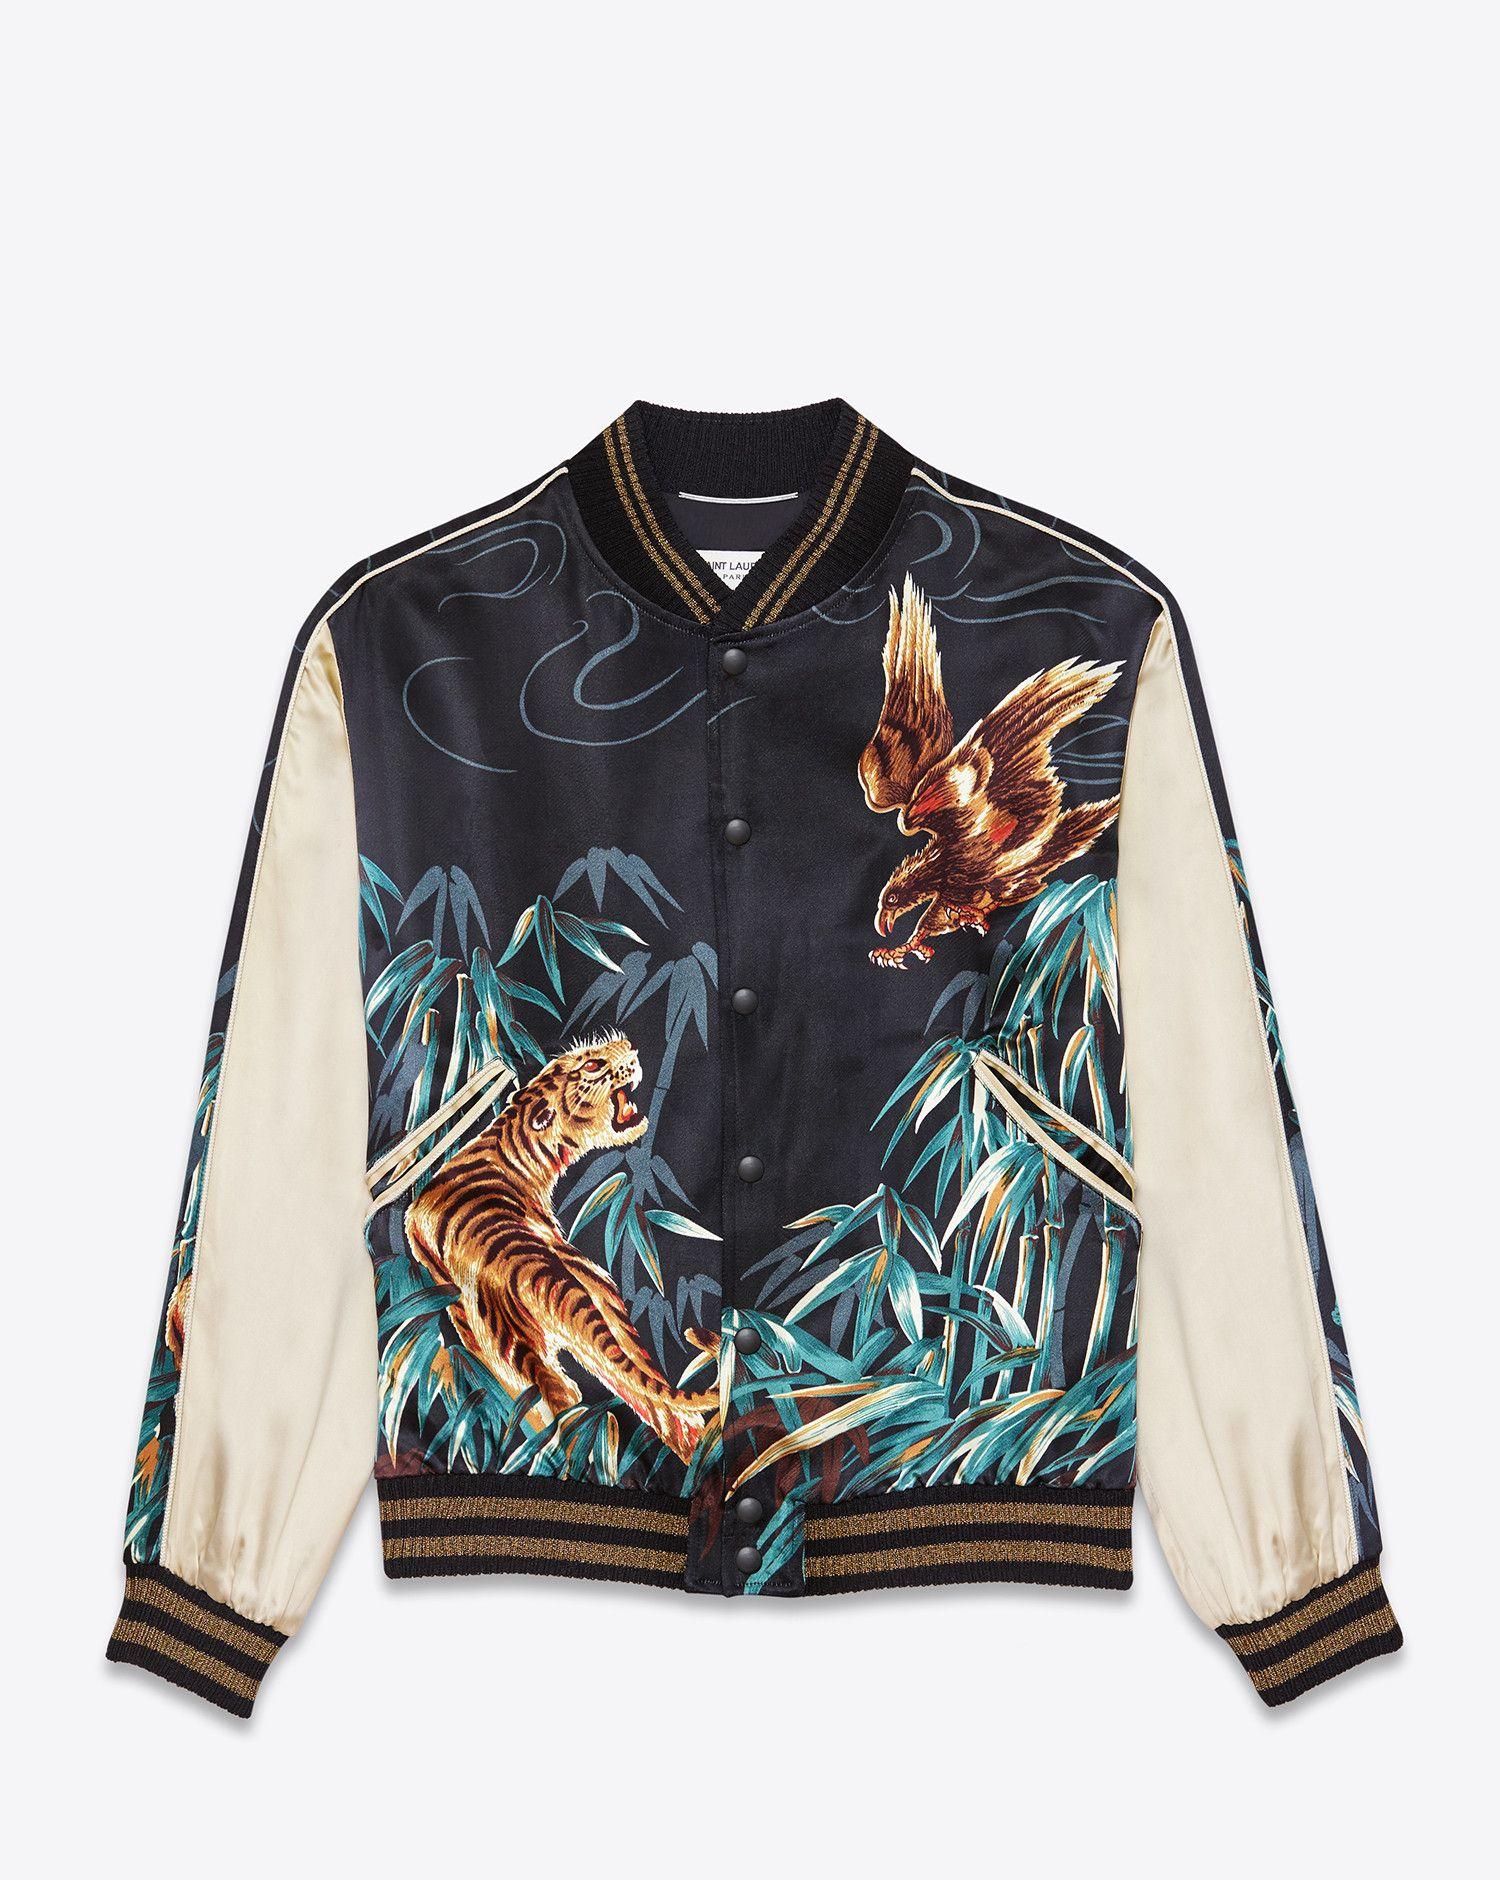 0de2311c1be6 Kanye West Spotted In Saint Laurent Jacket   Custom Vans Sneakers ...